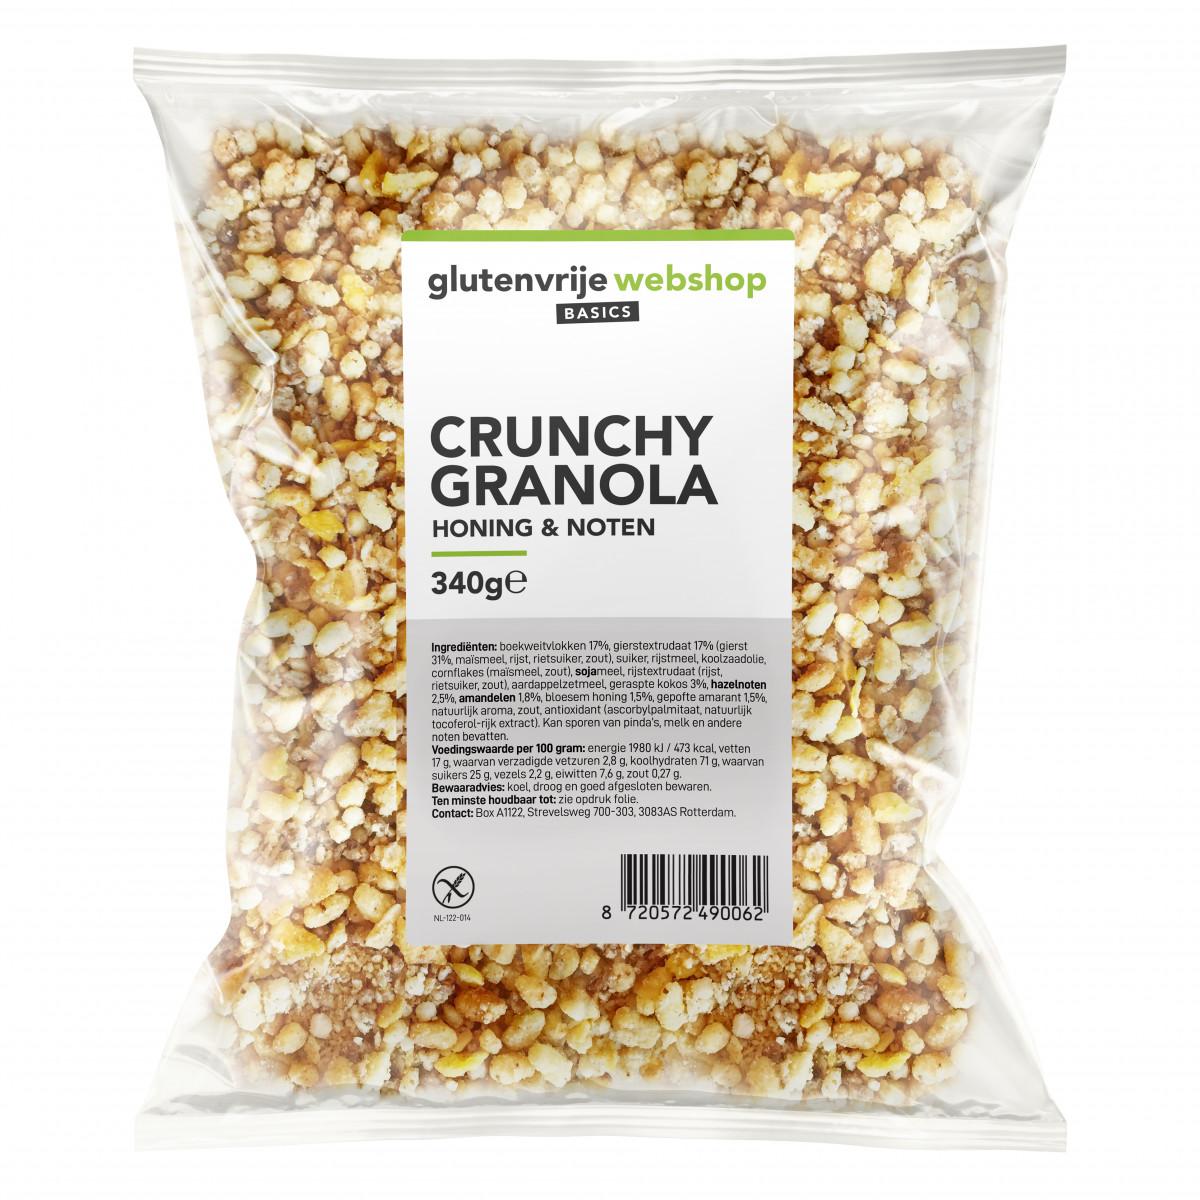 Crunchy Granola Honing & Noten